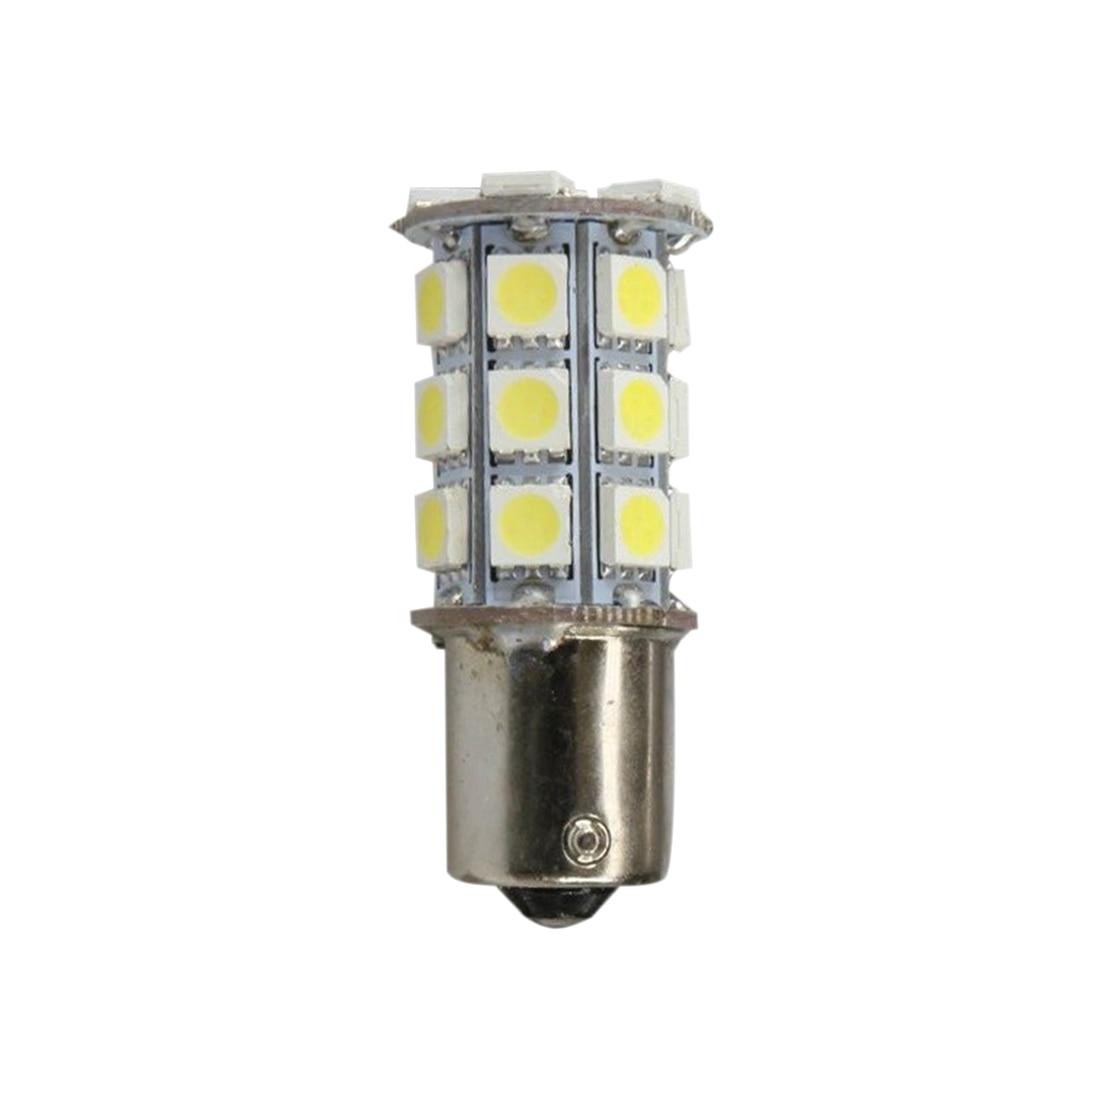 20 X Warm White 27 SMD LED 1156 1141 1003 RV Camper Trailer Light Bulbs